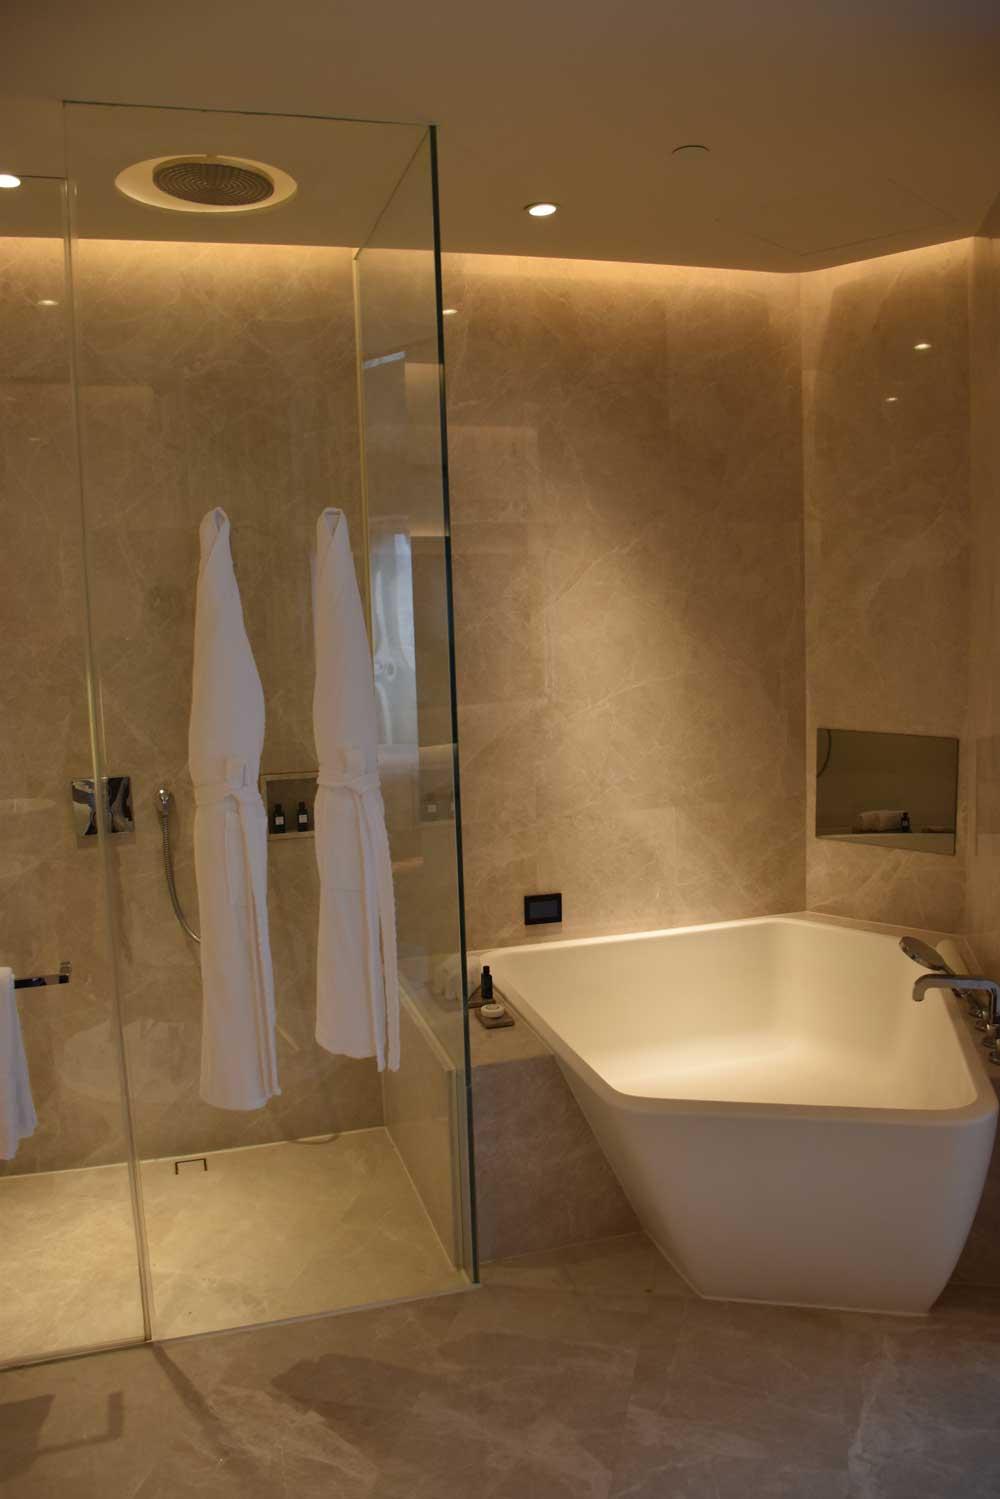 Morpheus Hotel Premier King shower and hot tub